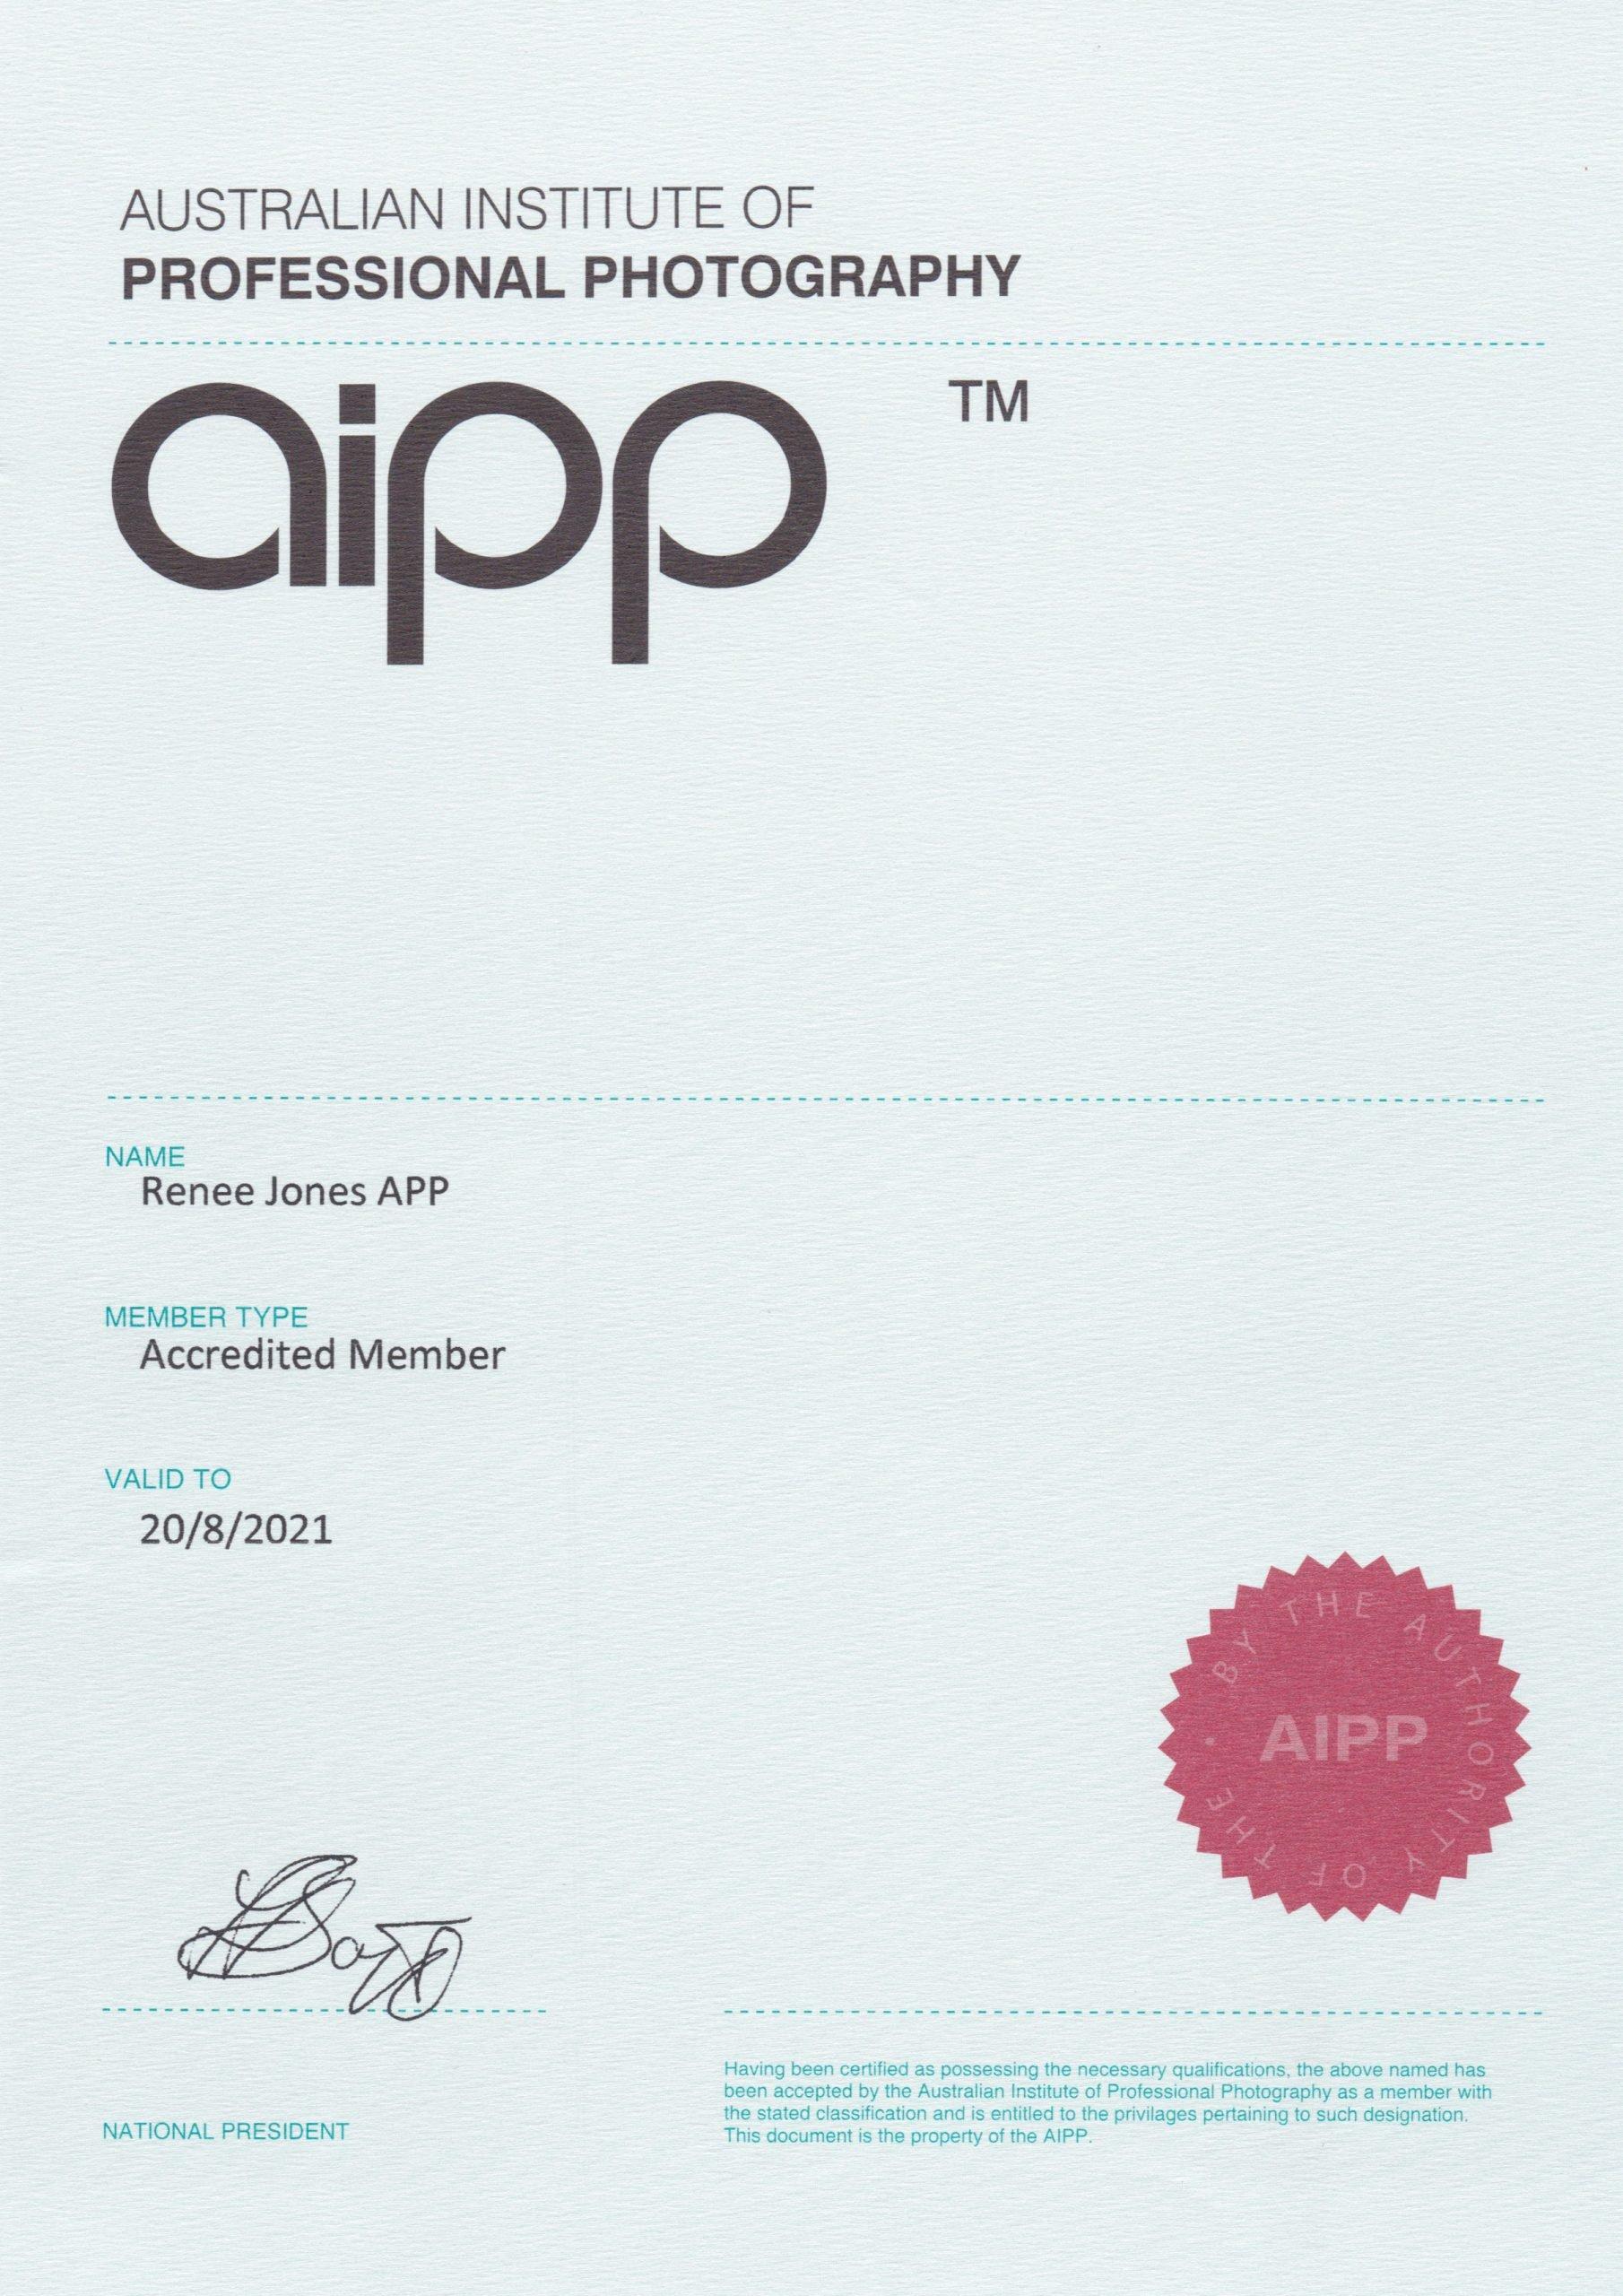 Australian Institute of Professional Photographers AIPP Accredited Professional Photographer certificate of Renee Jones